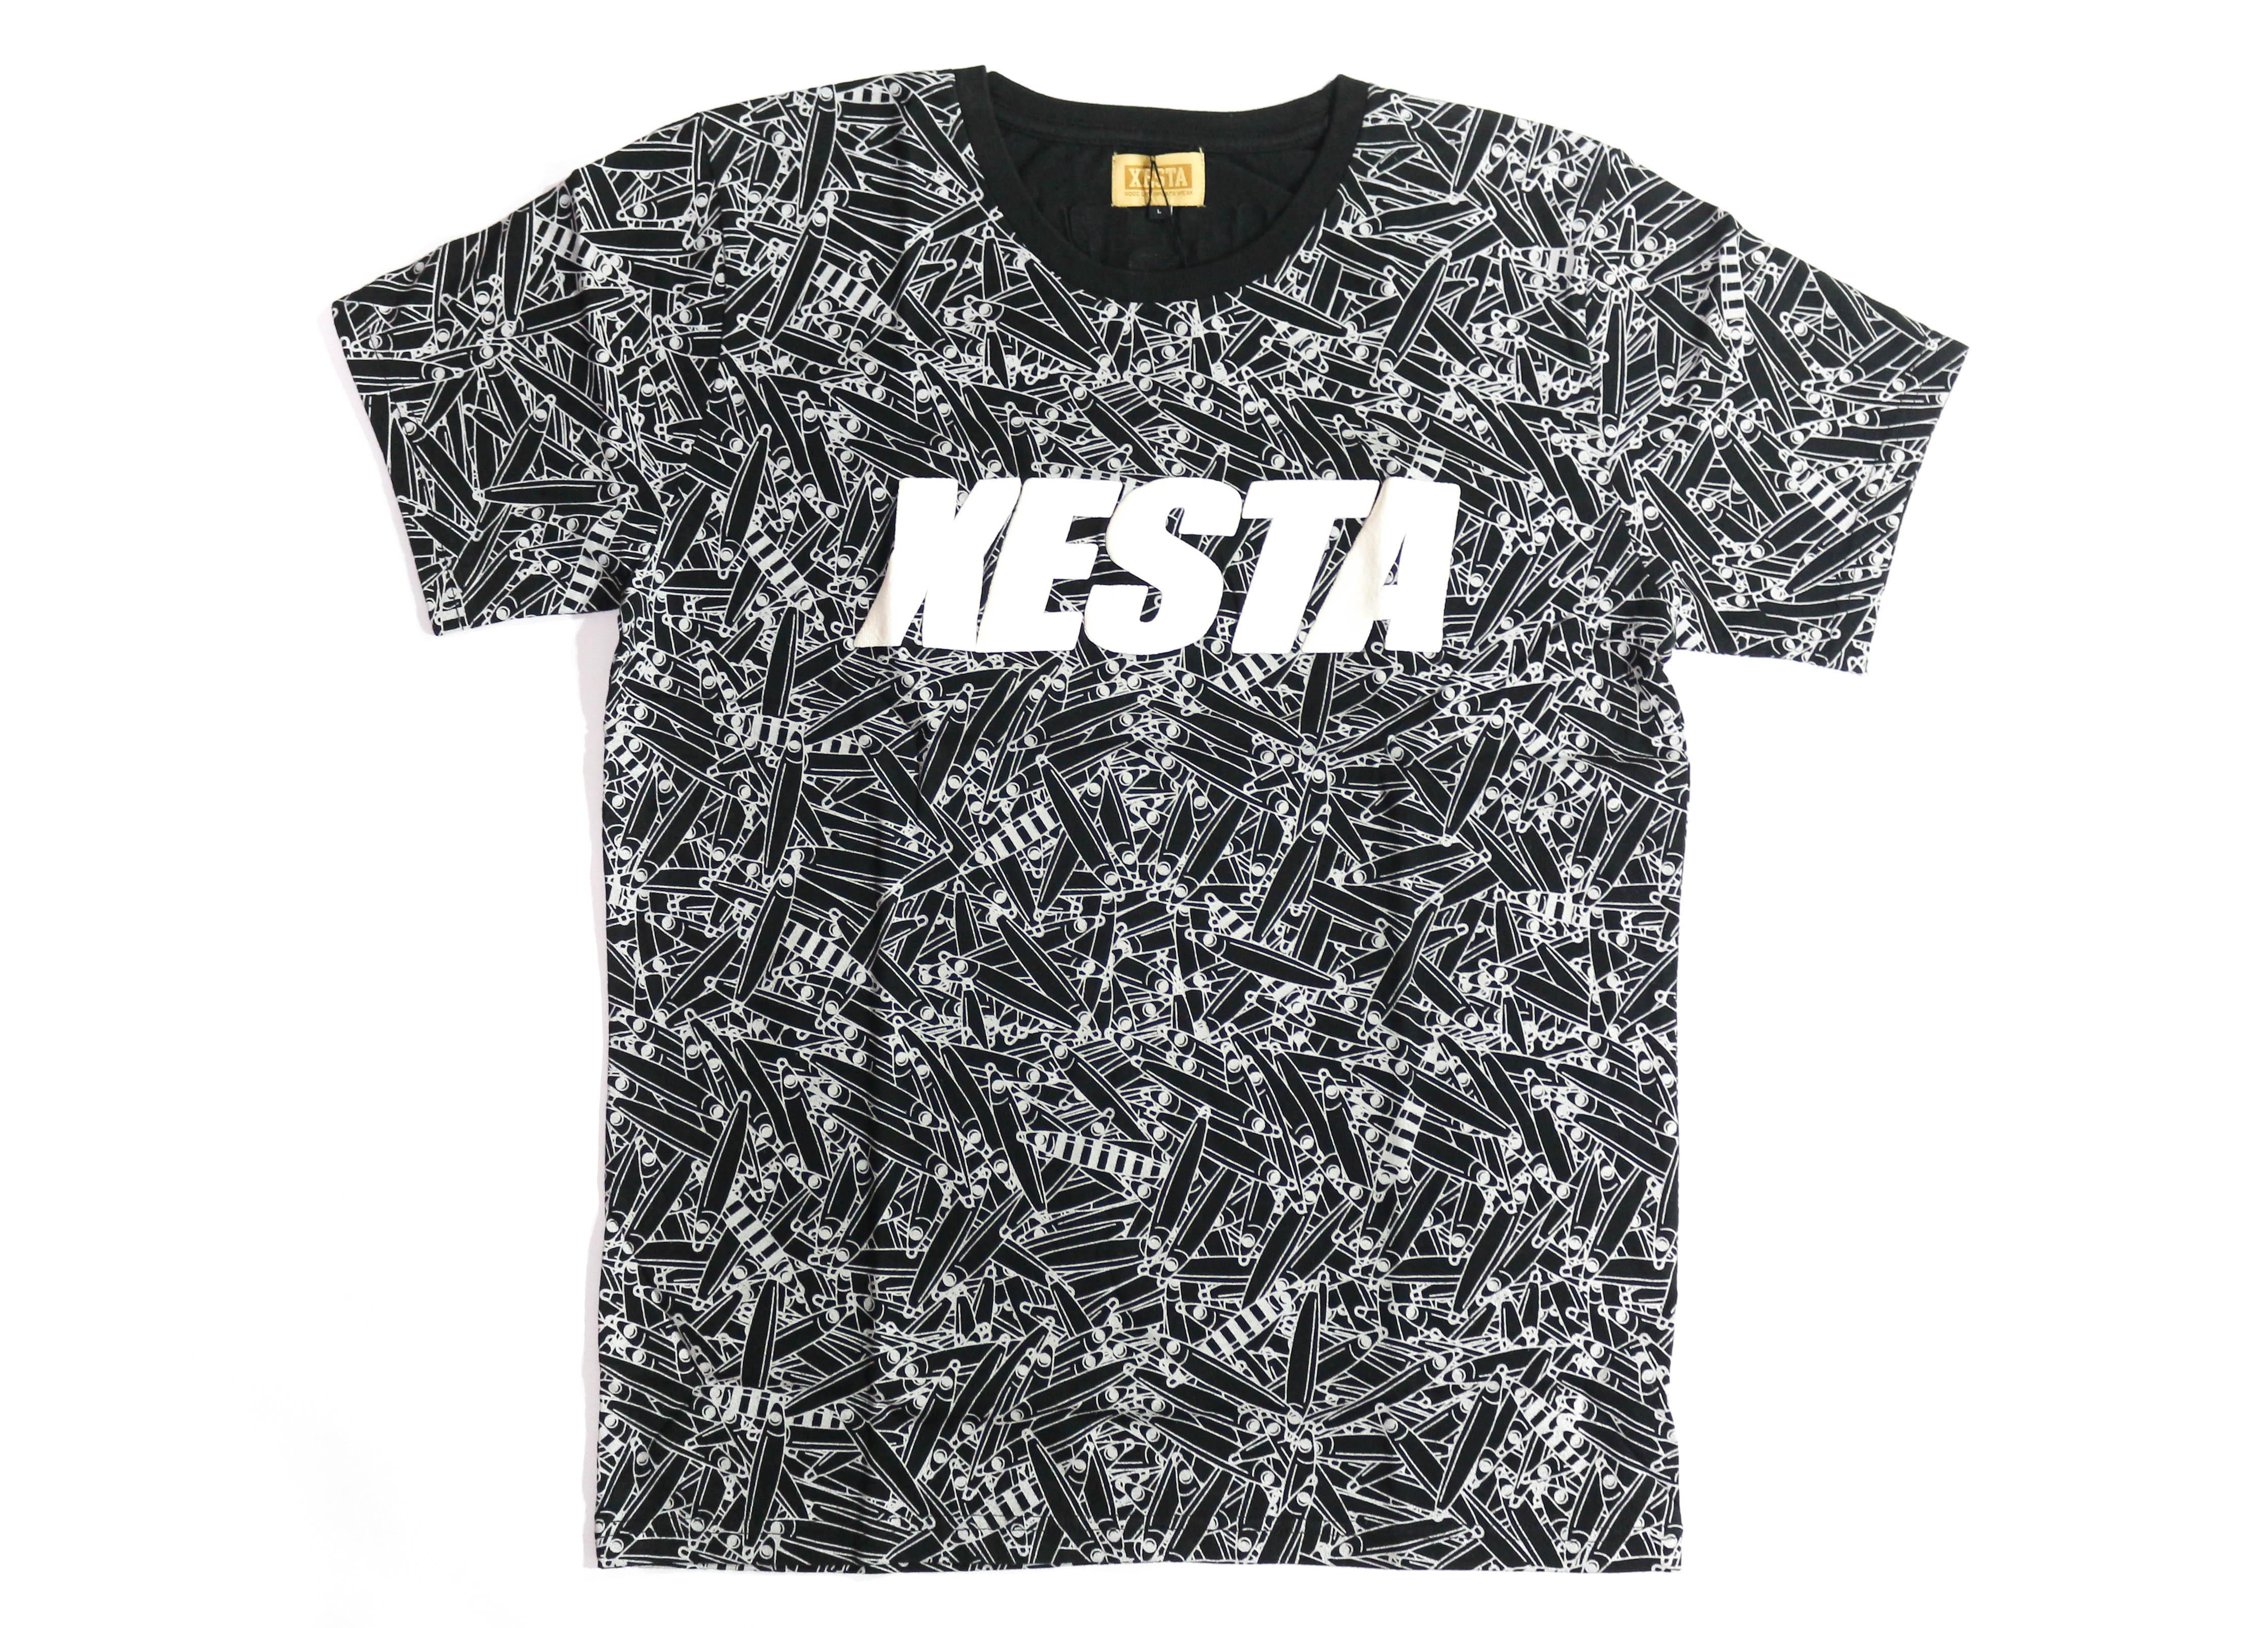 Sale Xesta T-shirt